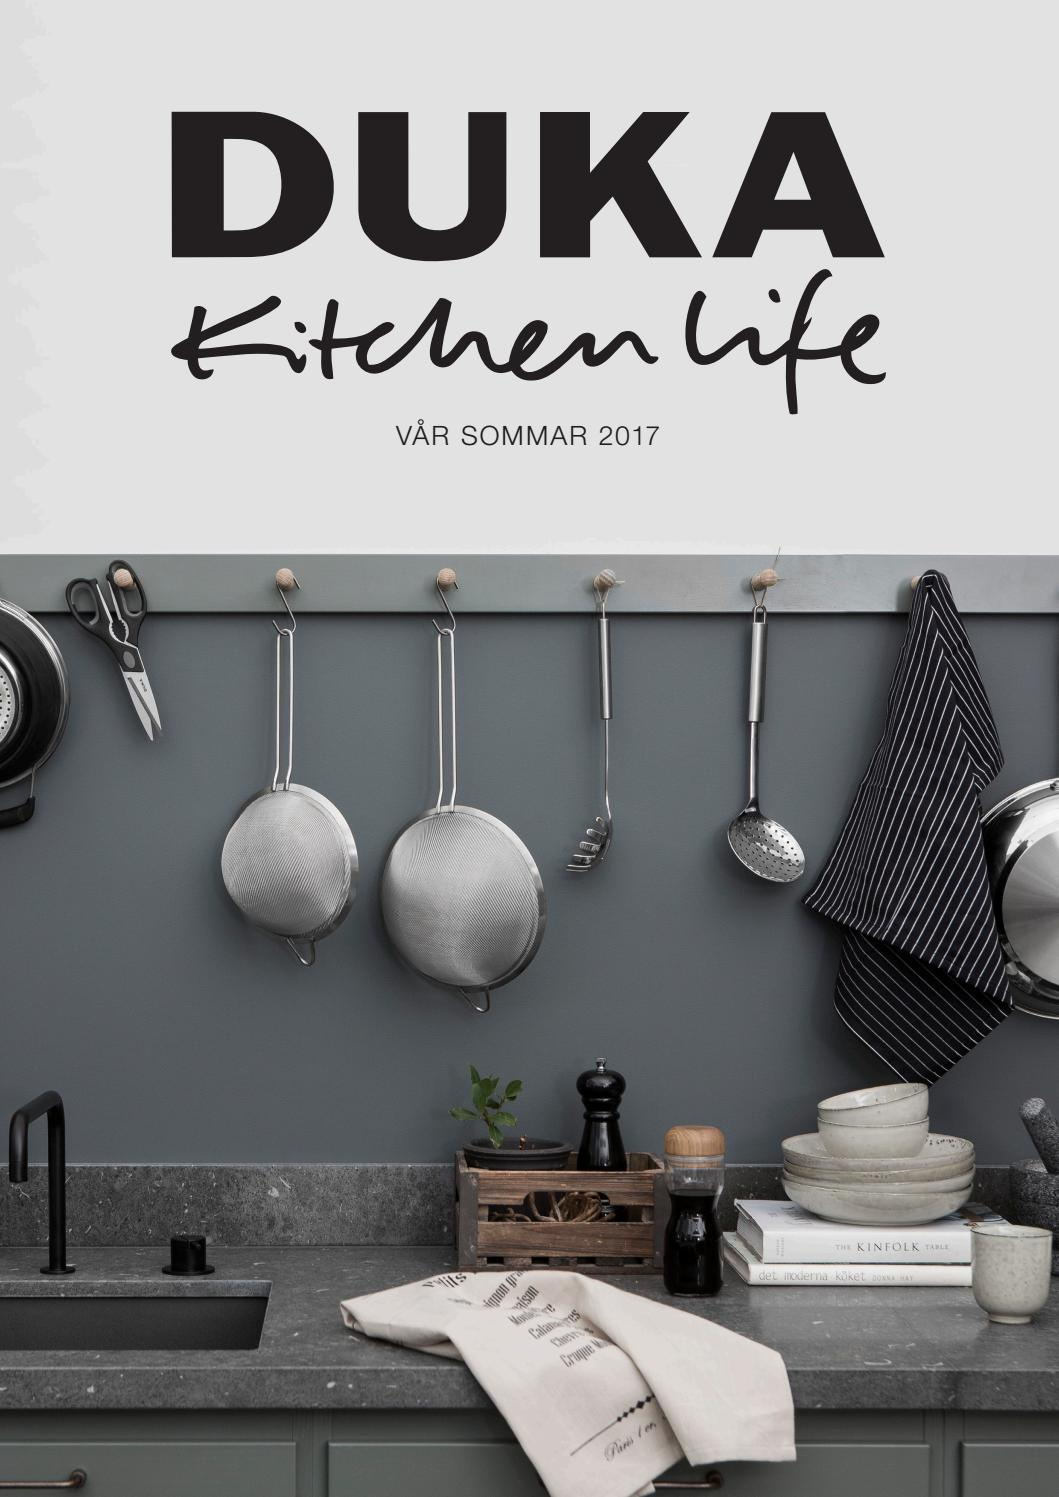 Duka kitchen life   autumn and winter by duka kitchen life   issuu